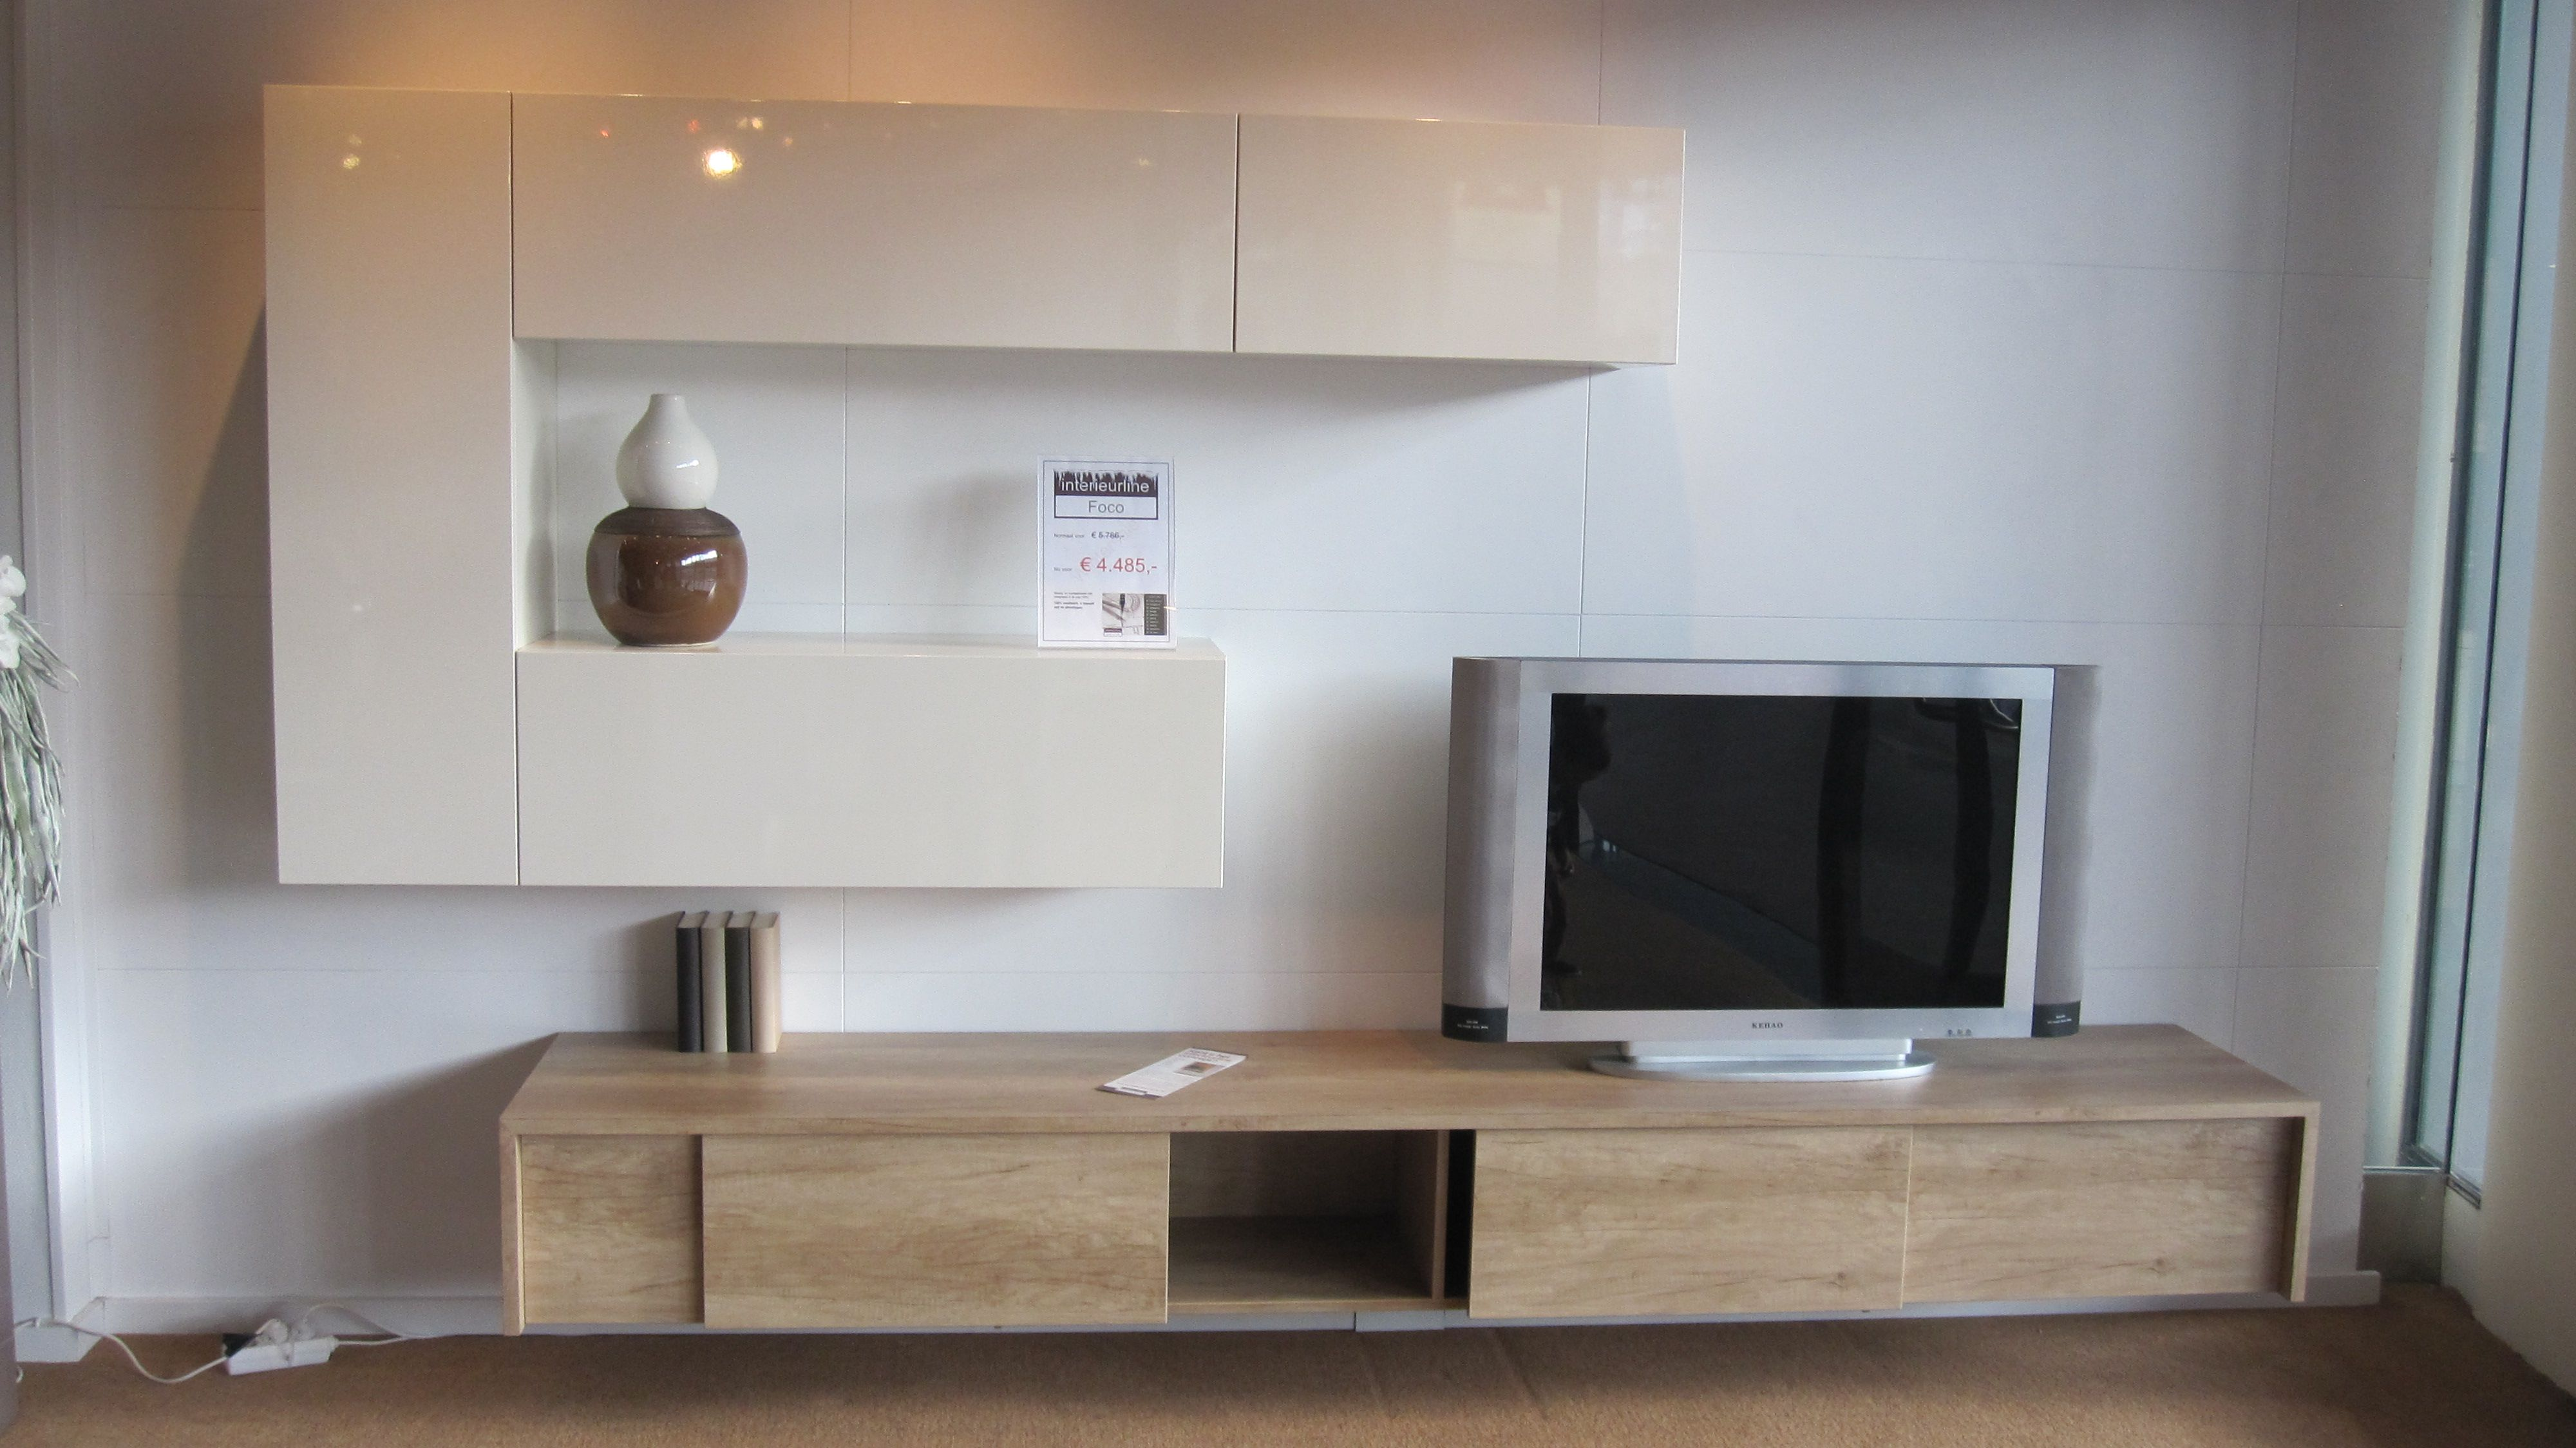 Tvs and design on pinterest